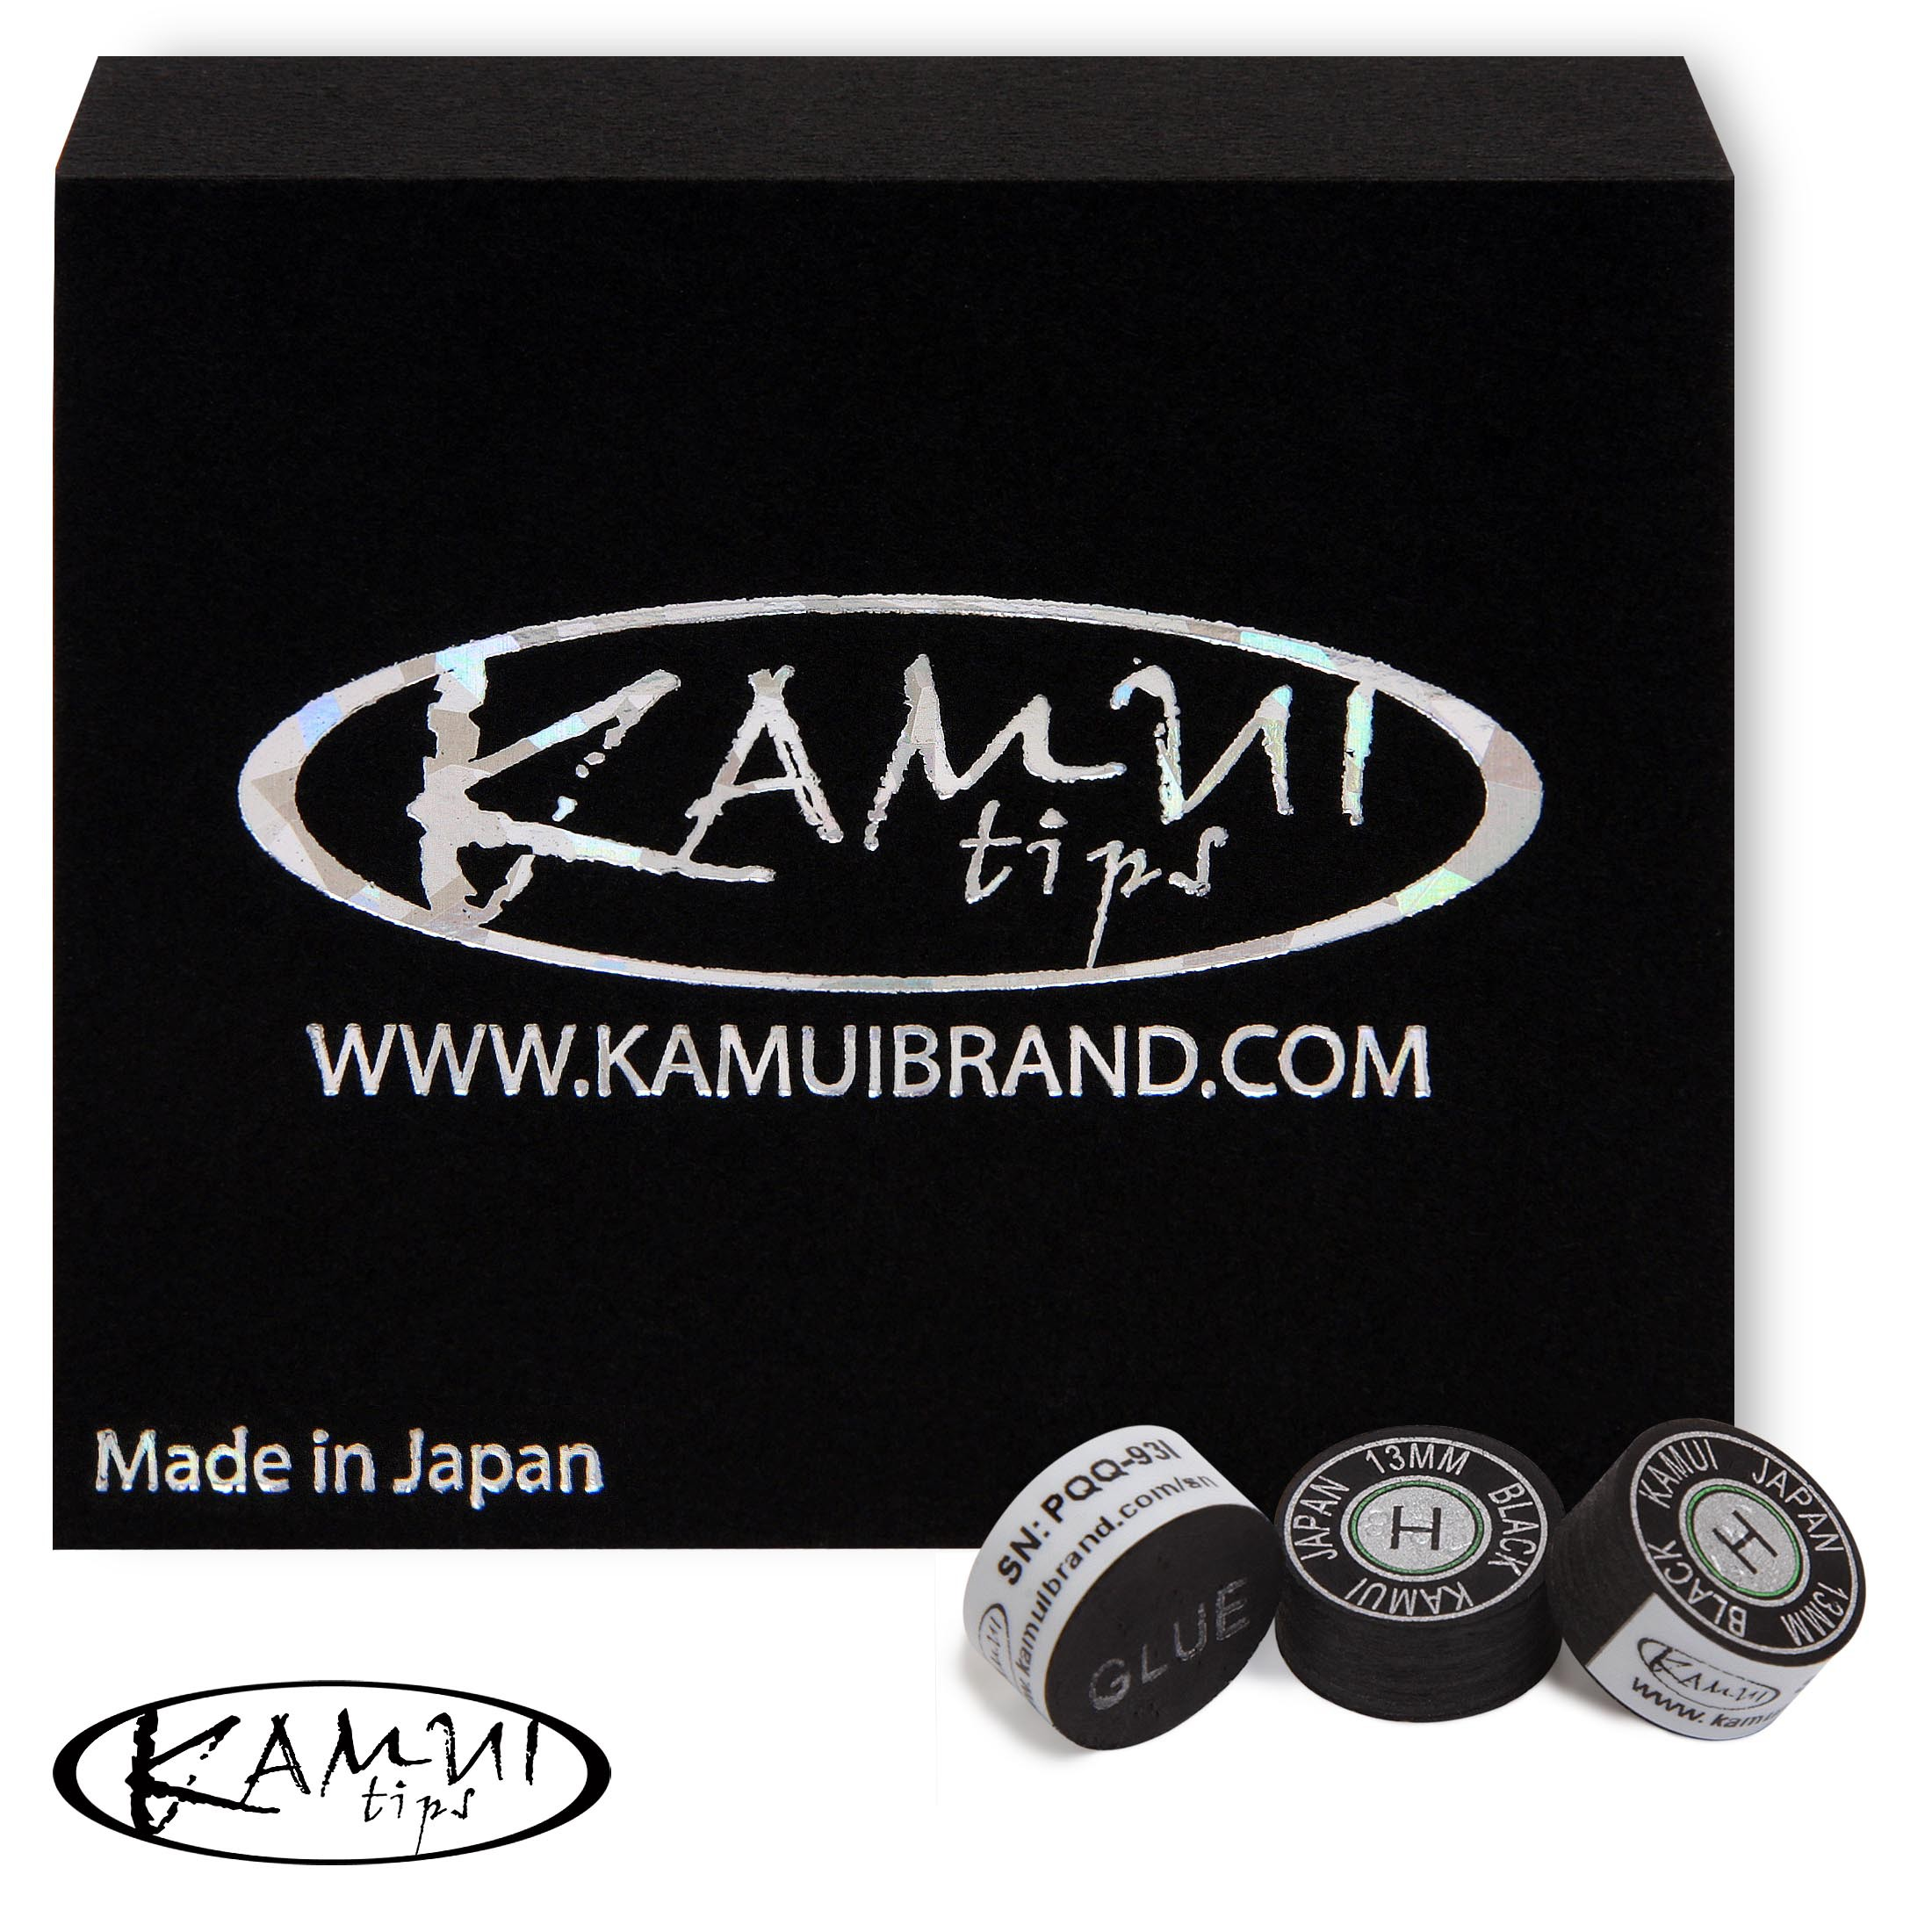 Наклейка для кия Kamui Black ø13мм Hard 1шт.